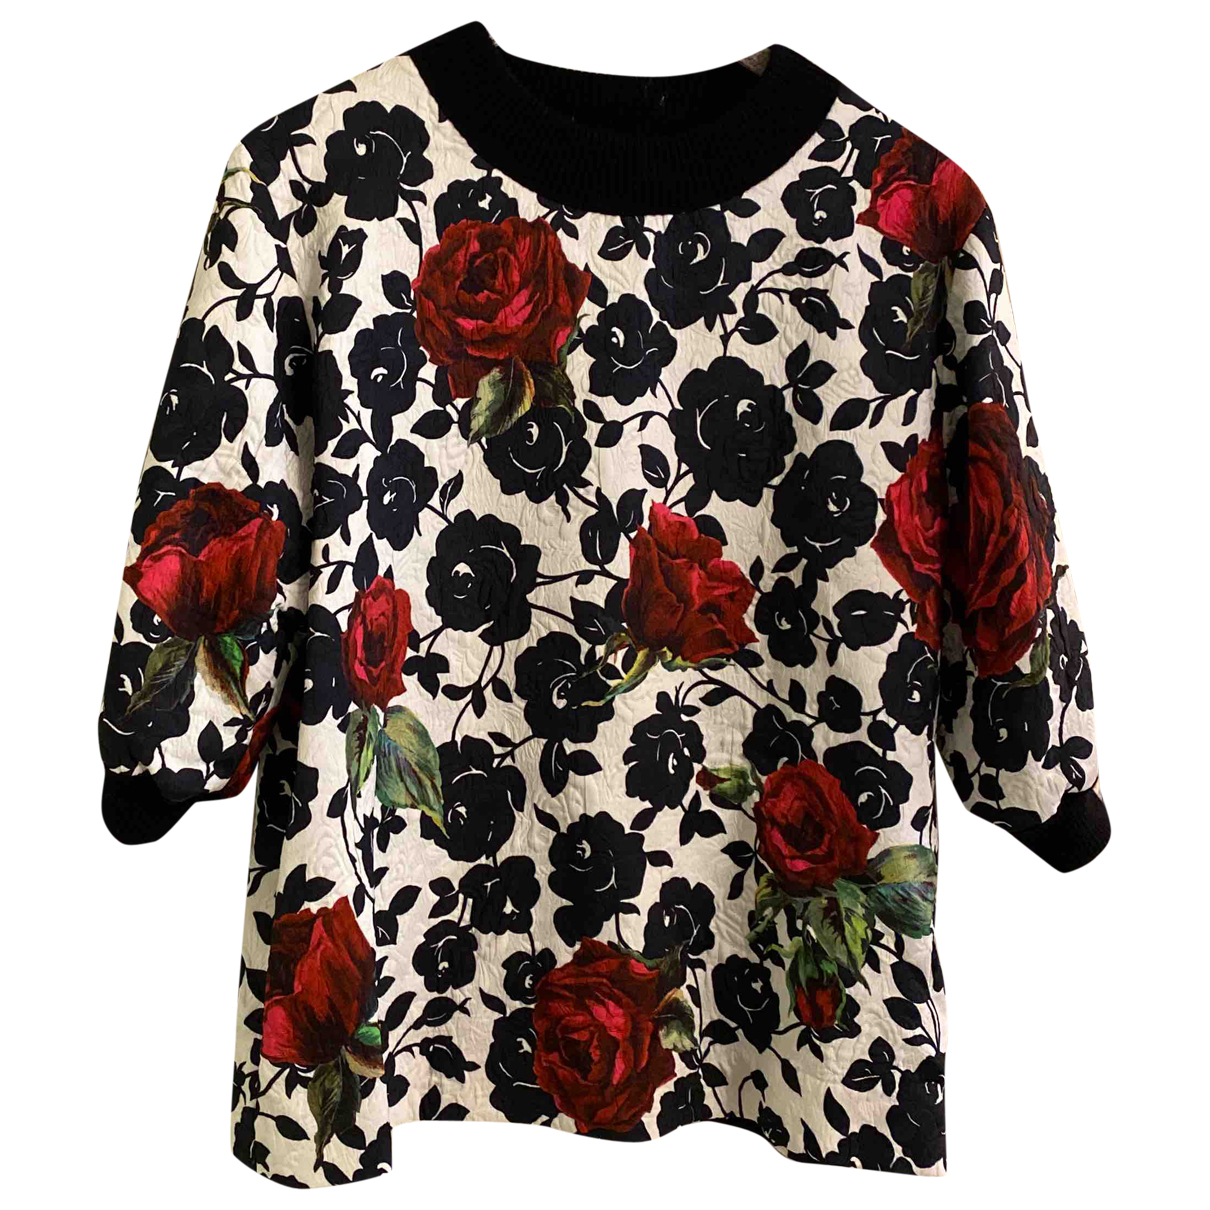 Dolce & Gabbana - Pull   pour femme - multicolore